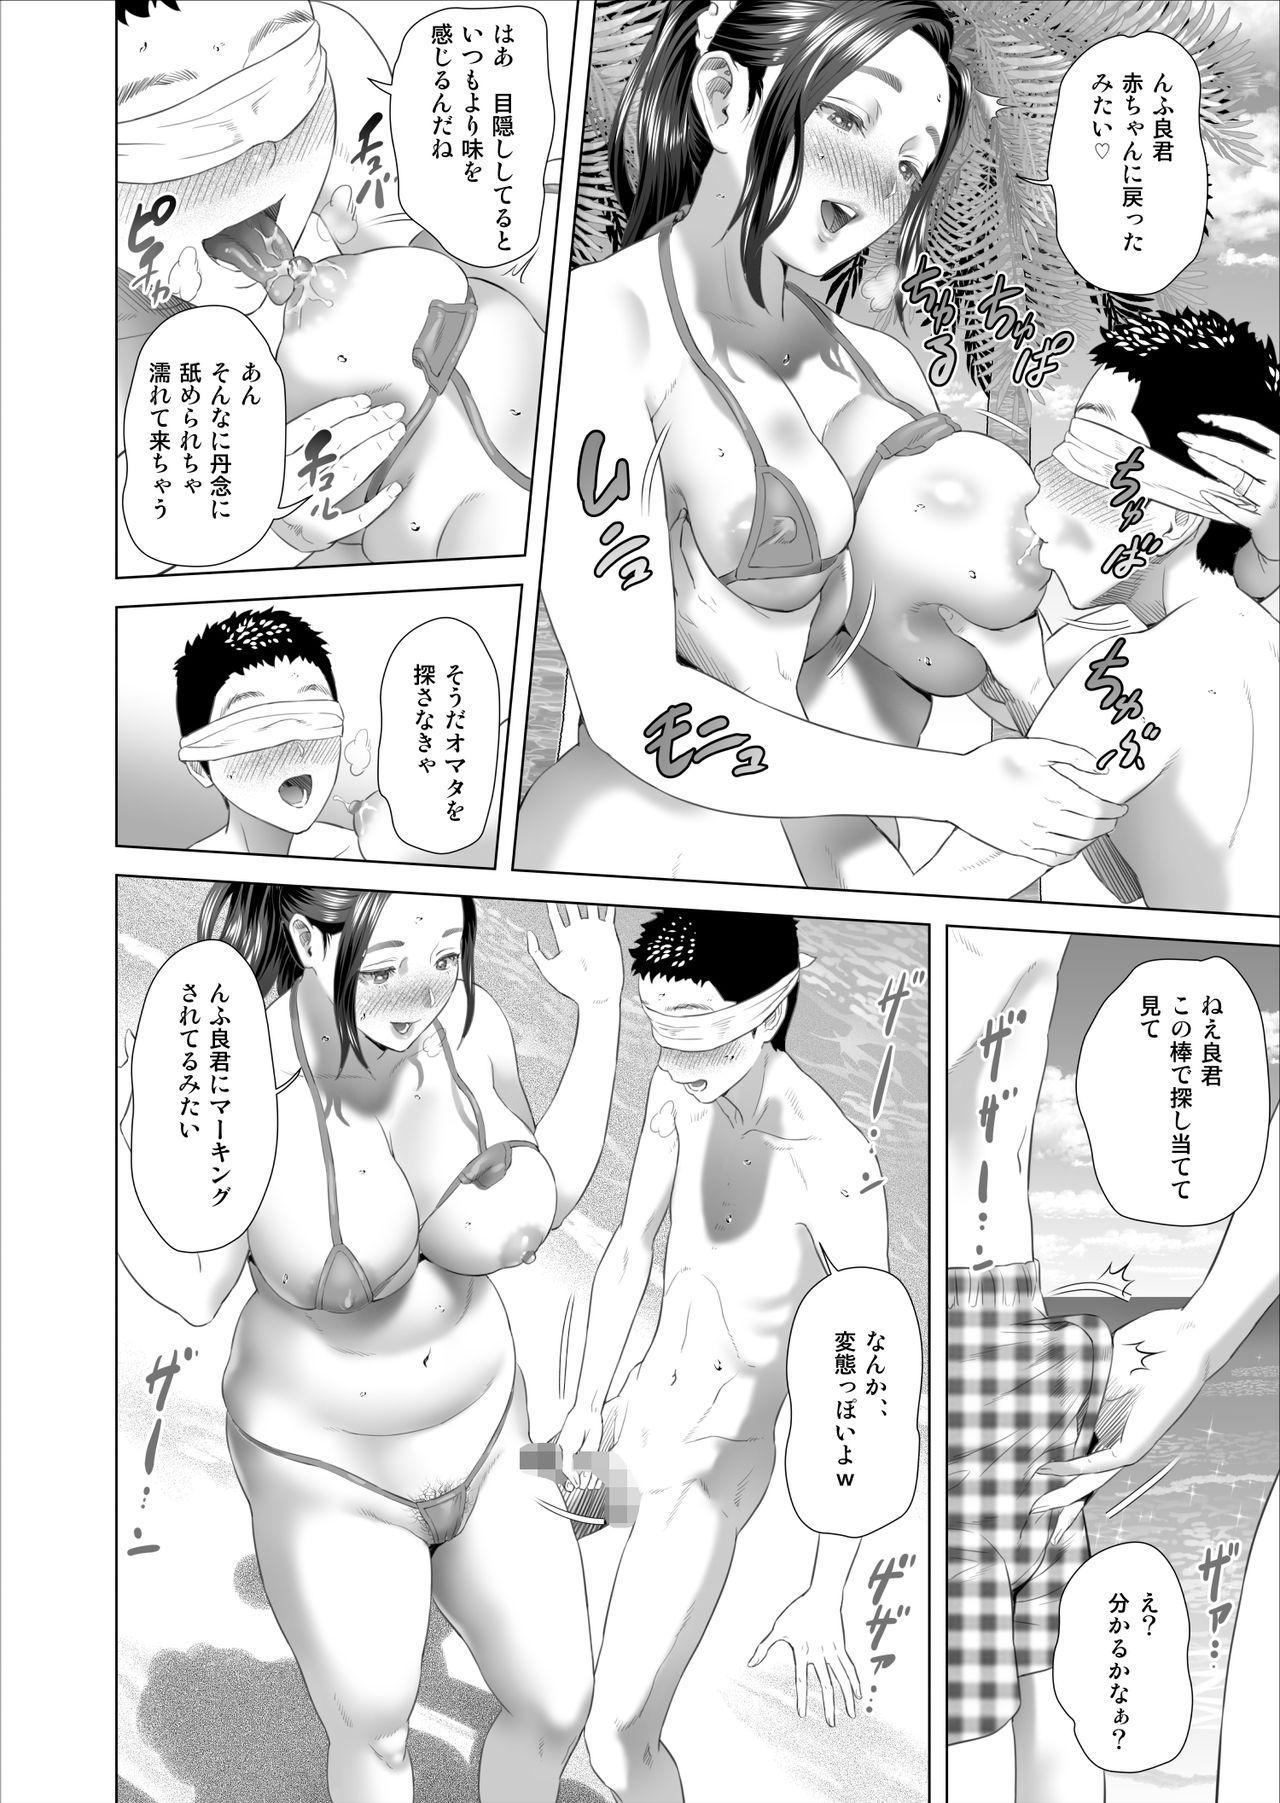 Kinjo Yuuwaku Musuko o Yobai ni Sasou Haha Hen | Neighborhood Seduction Mother Lures Son for a Night Visit! 187